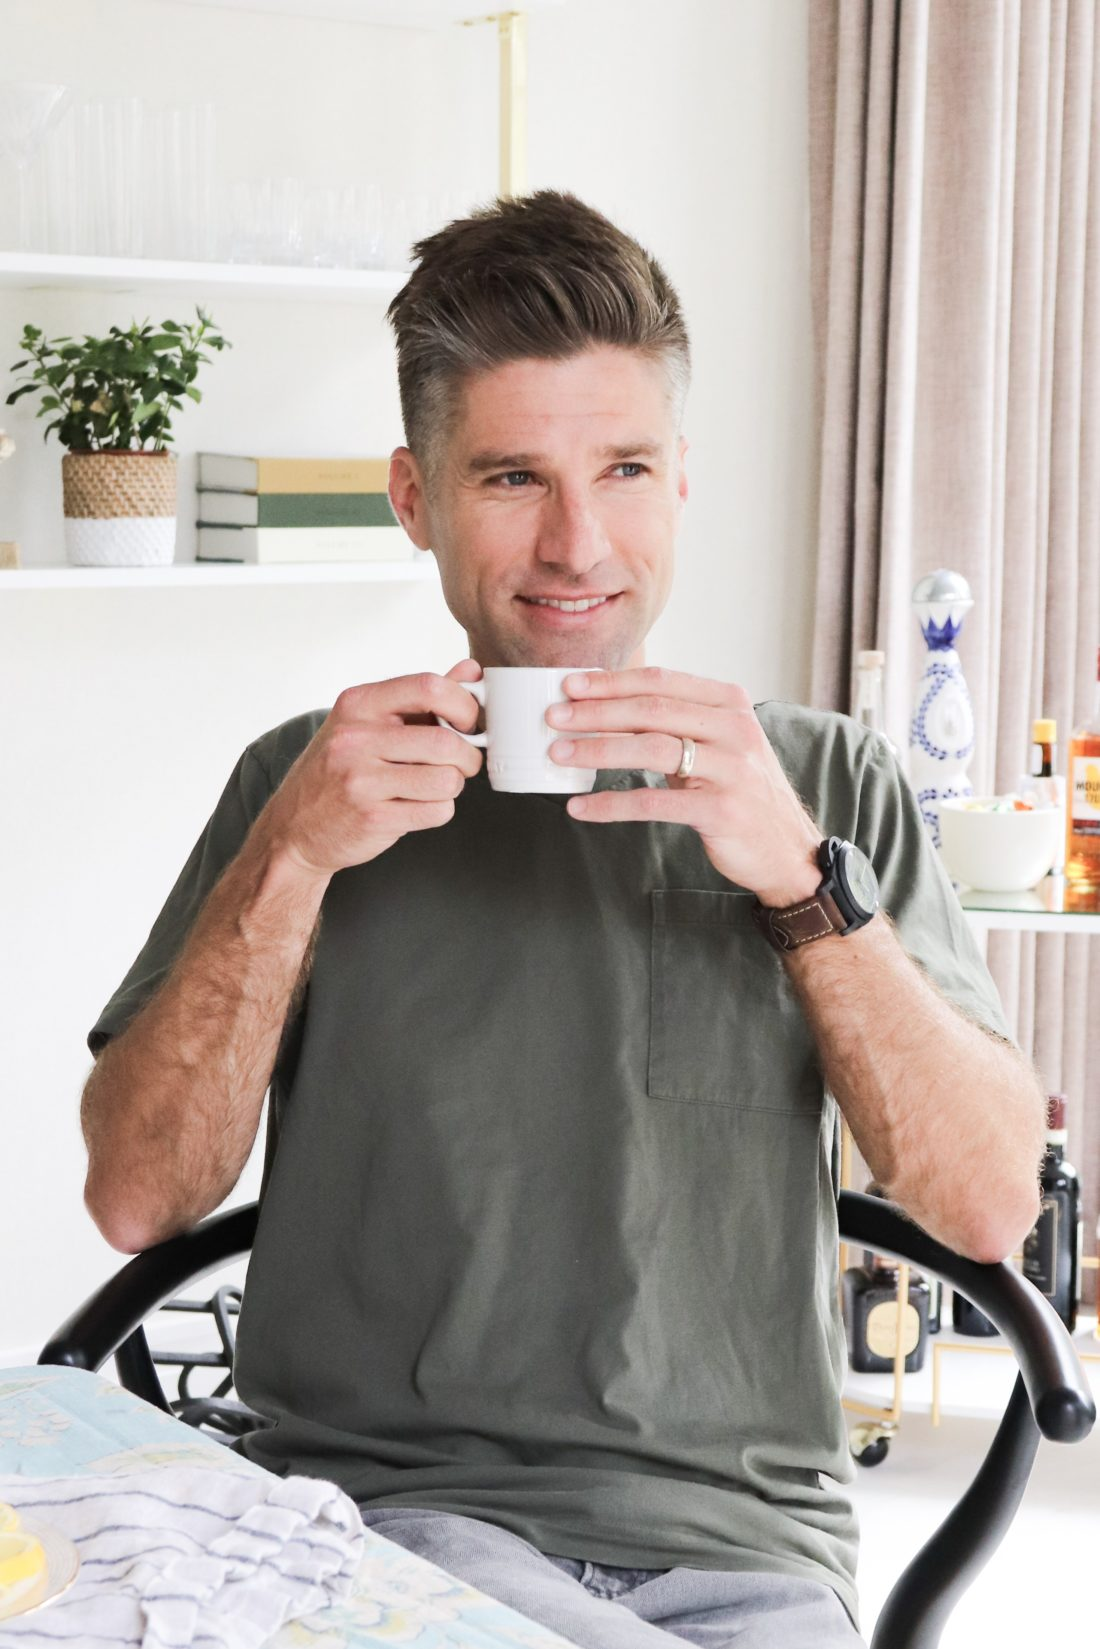 Eva Amurri Martino's husband Kyle reaching for a Le Cruesset mug